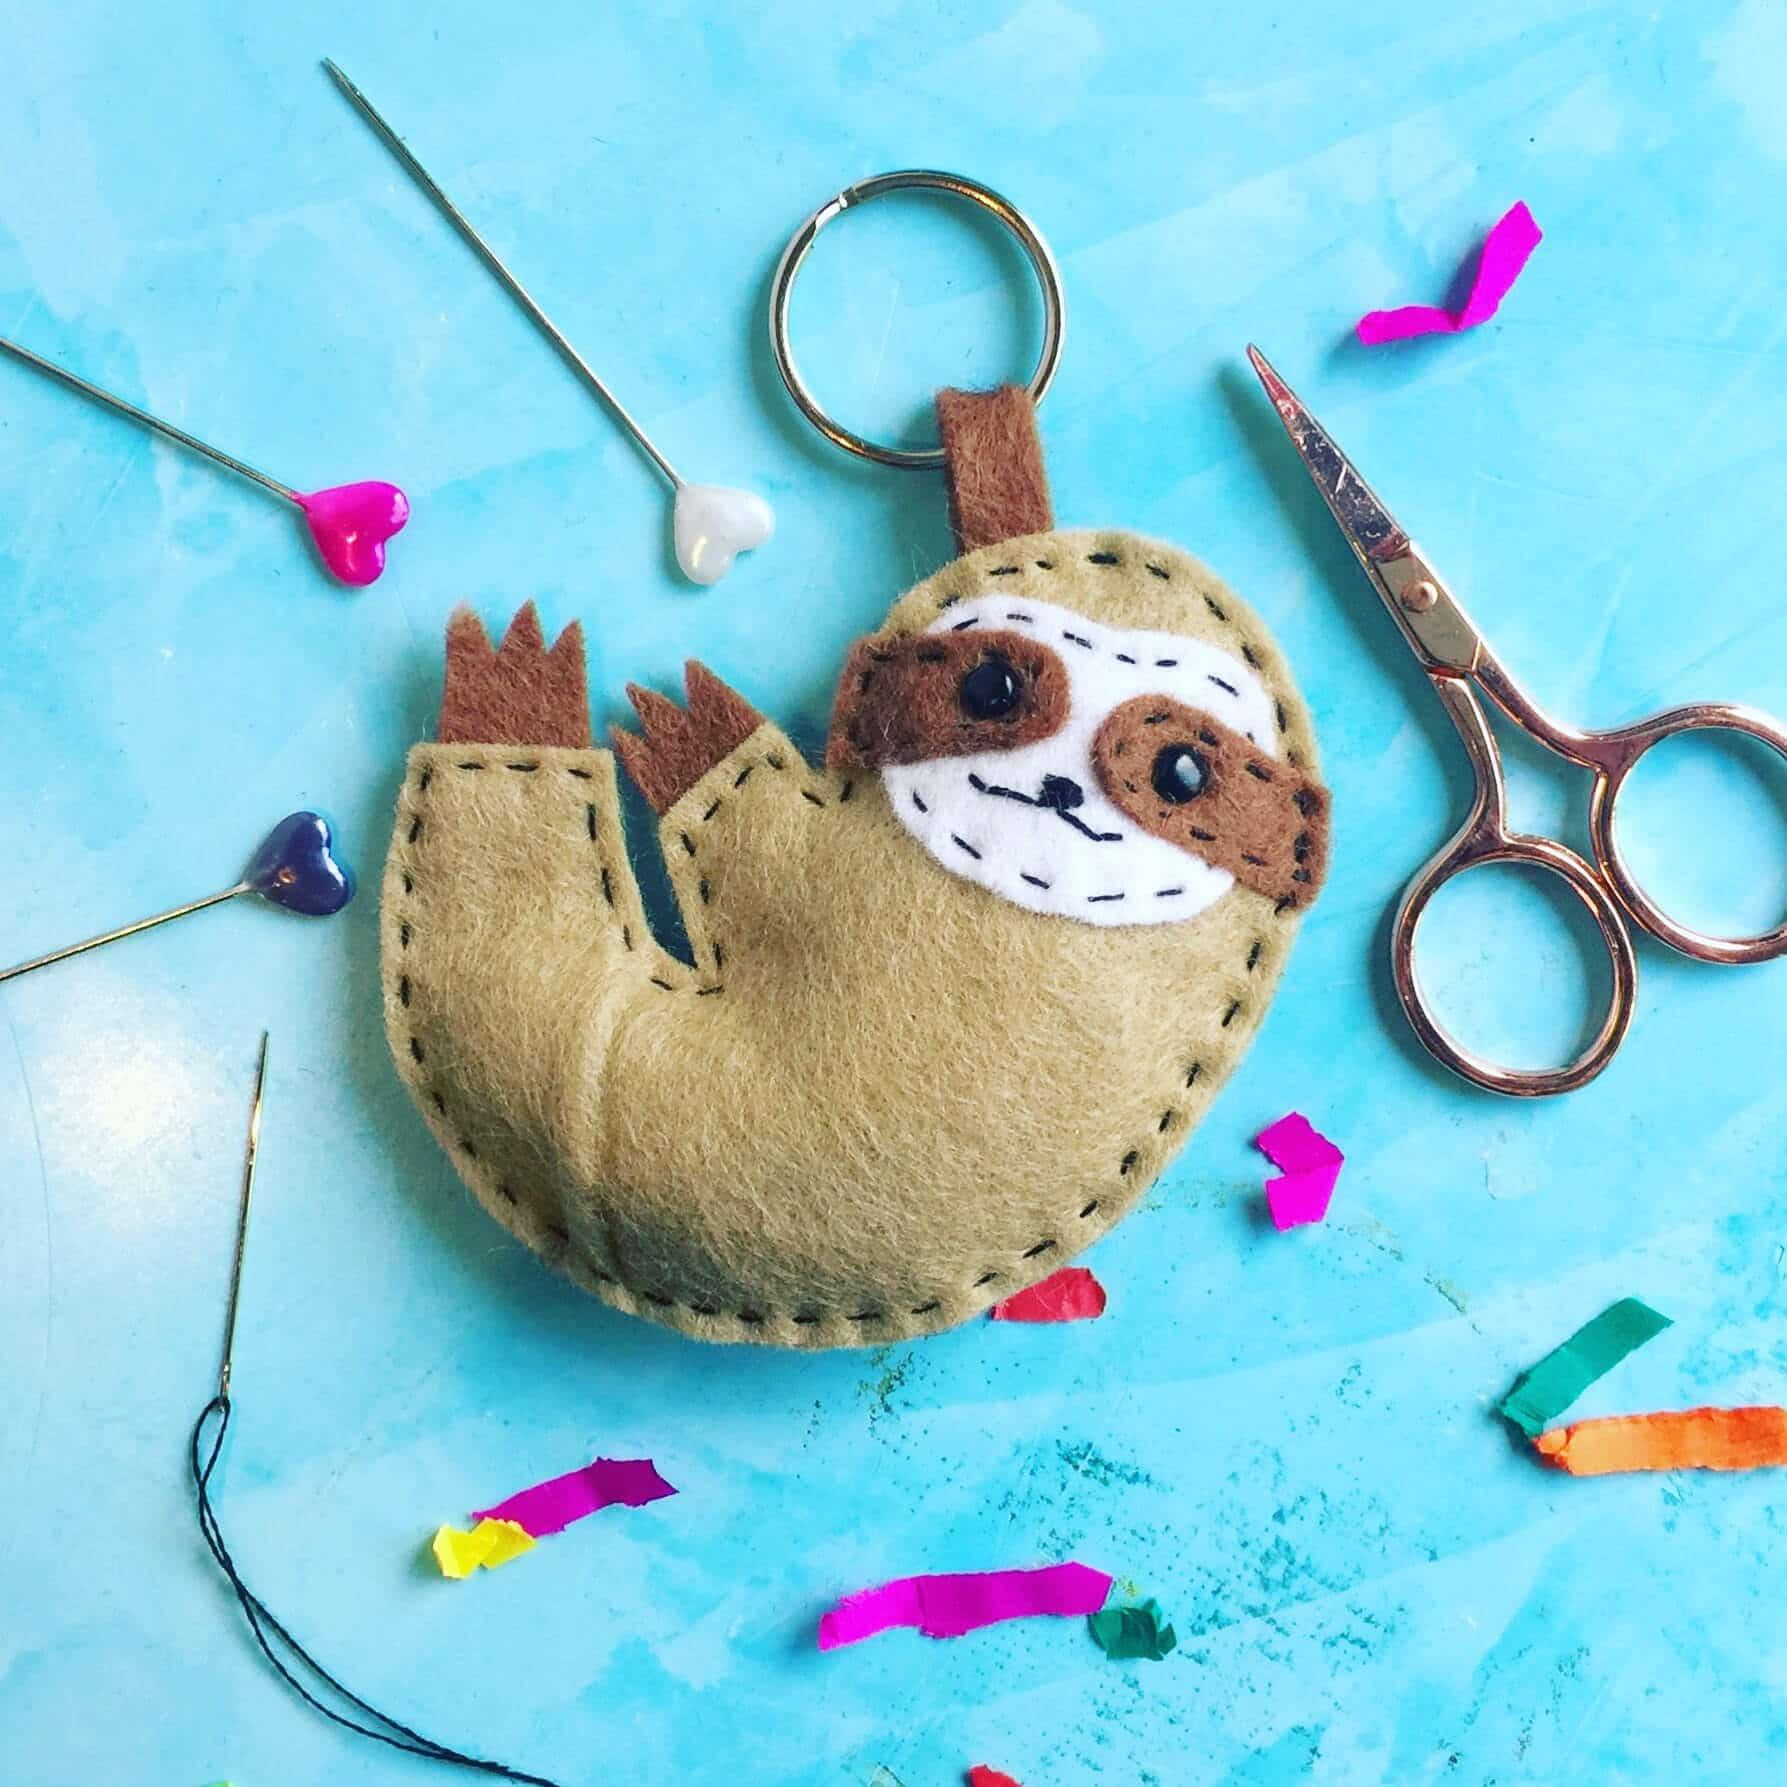 Stocking filler ideas for tweens, stocking filler ideas for 9 year old girl, craft stocking filler idea